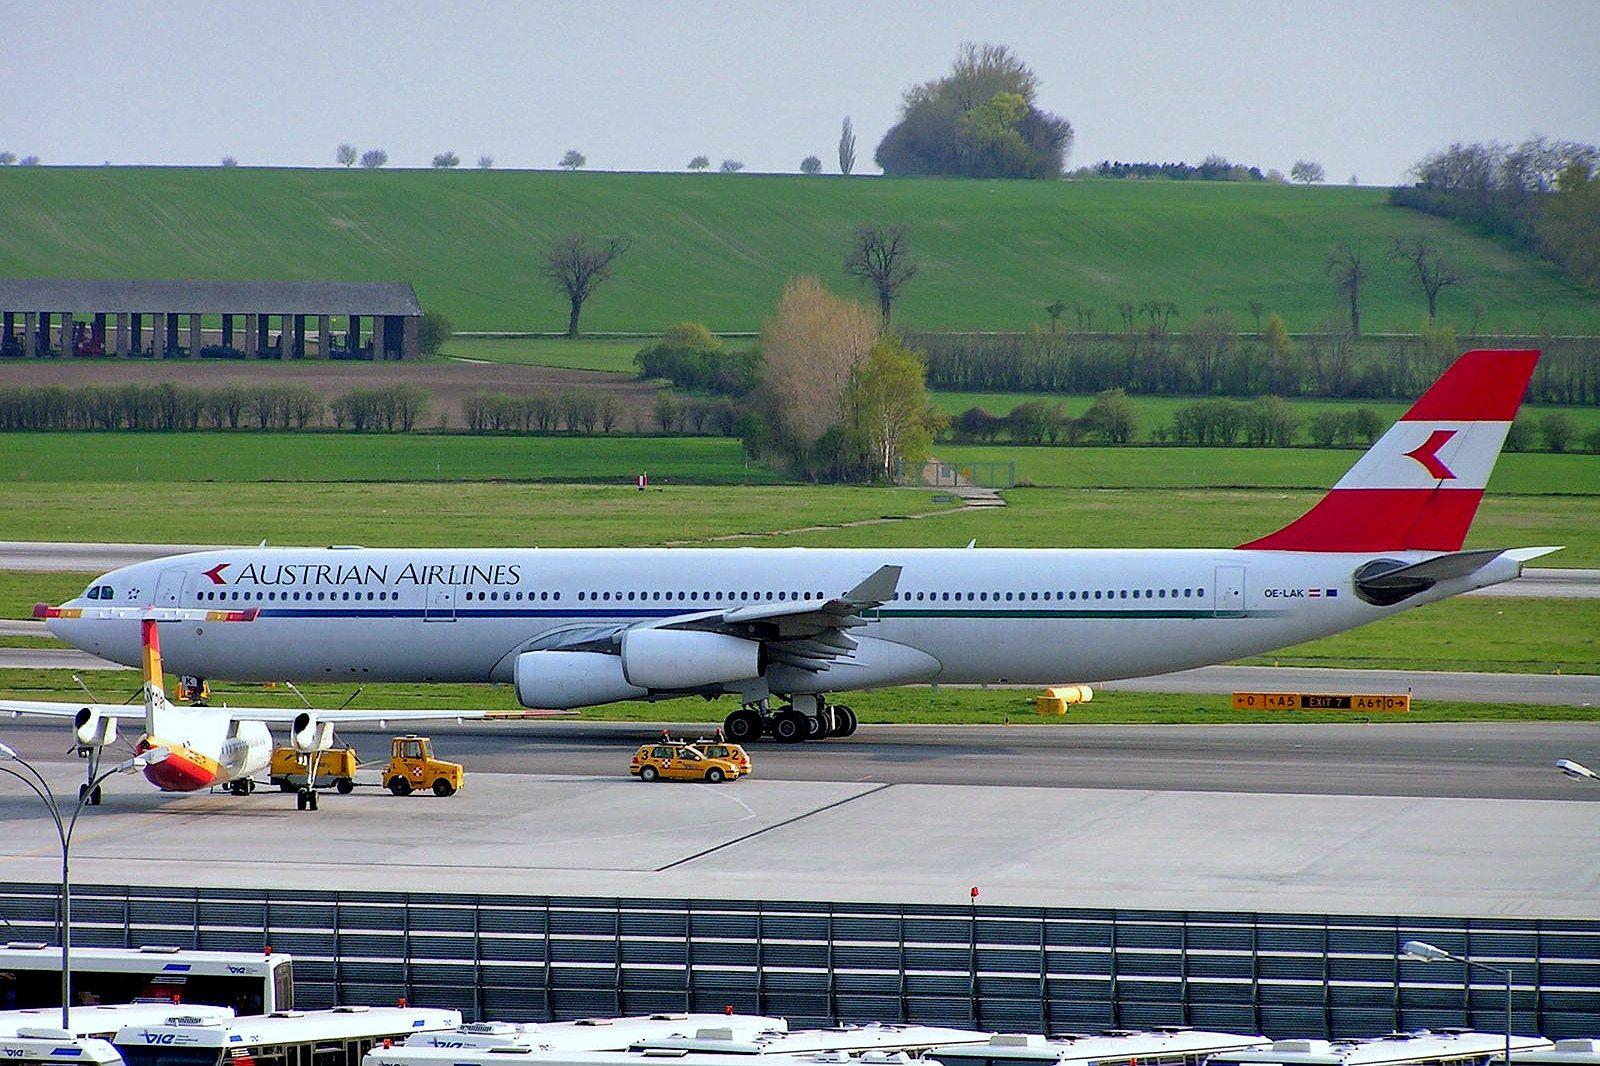 OELAK Airbus A340313X [169] (Austrian Airlines) Vienna